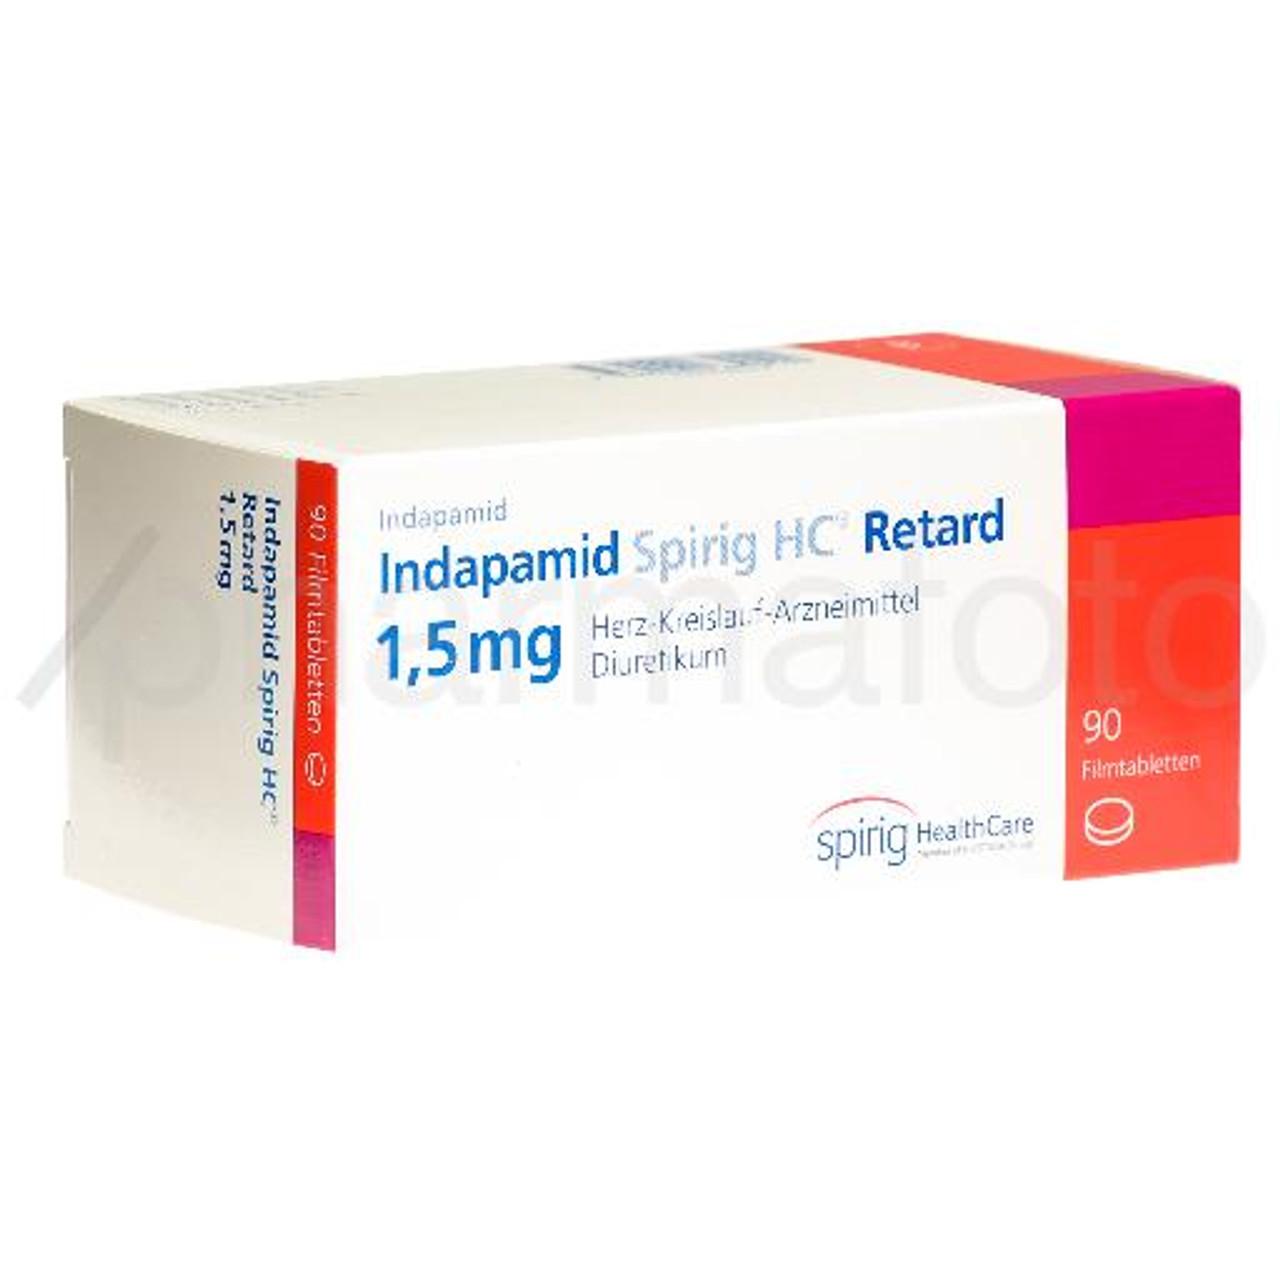 INDAPAMID Spirig HC cpr pell ret 20.20 mg 20 pce   Pharmafoto